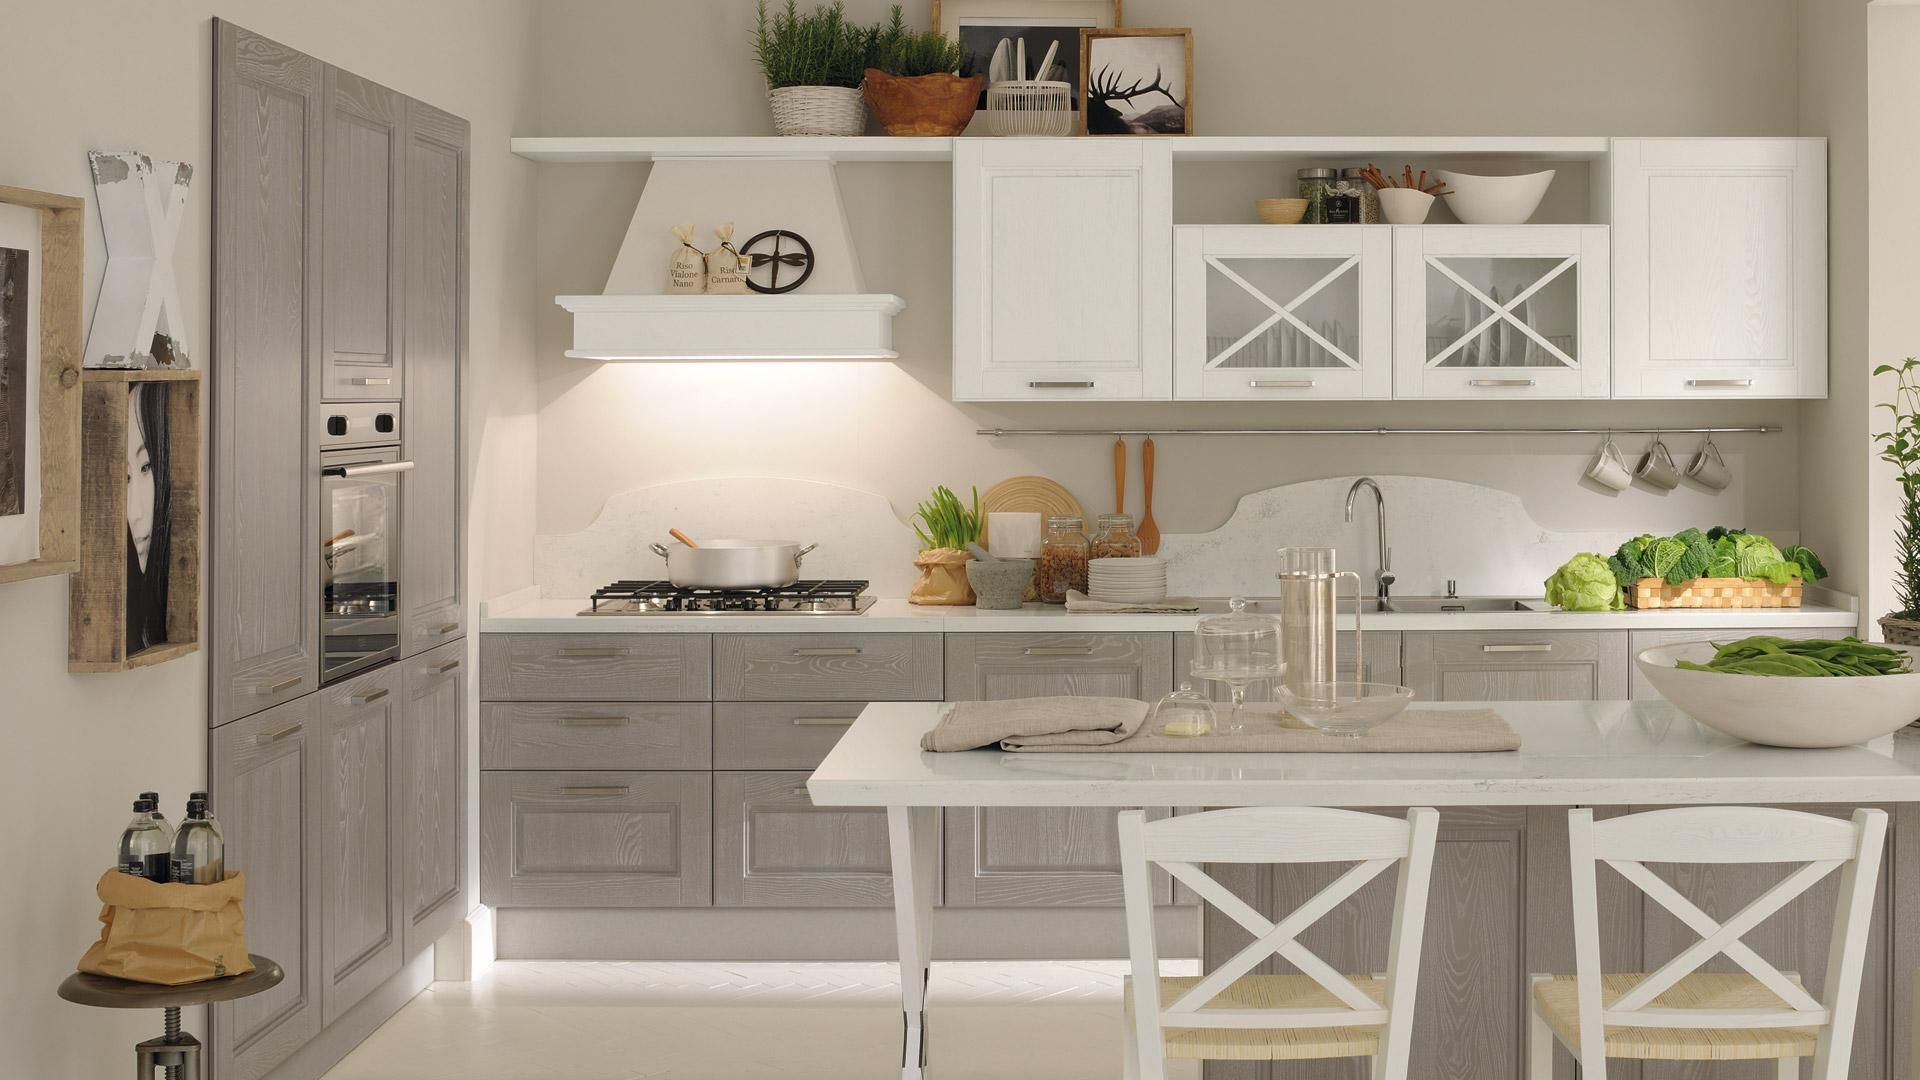 Agnese - Cucine Classiche - Cucine Lube | Cucine | Pinterest ...